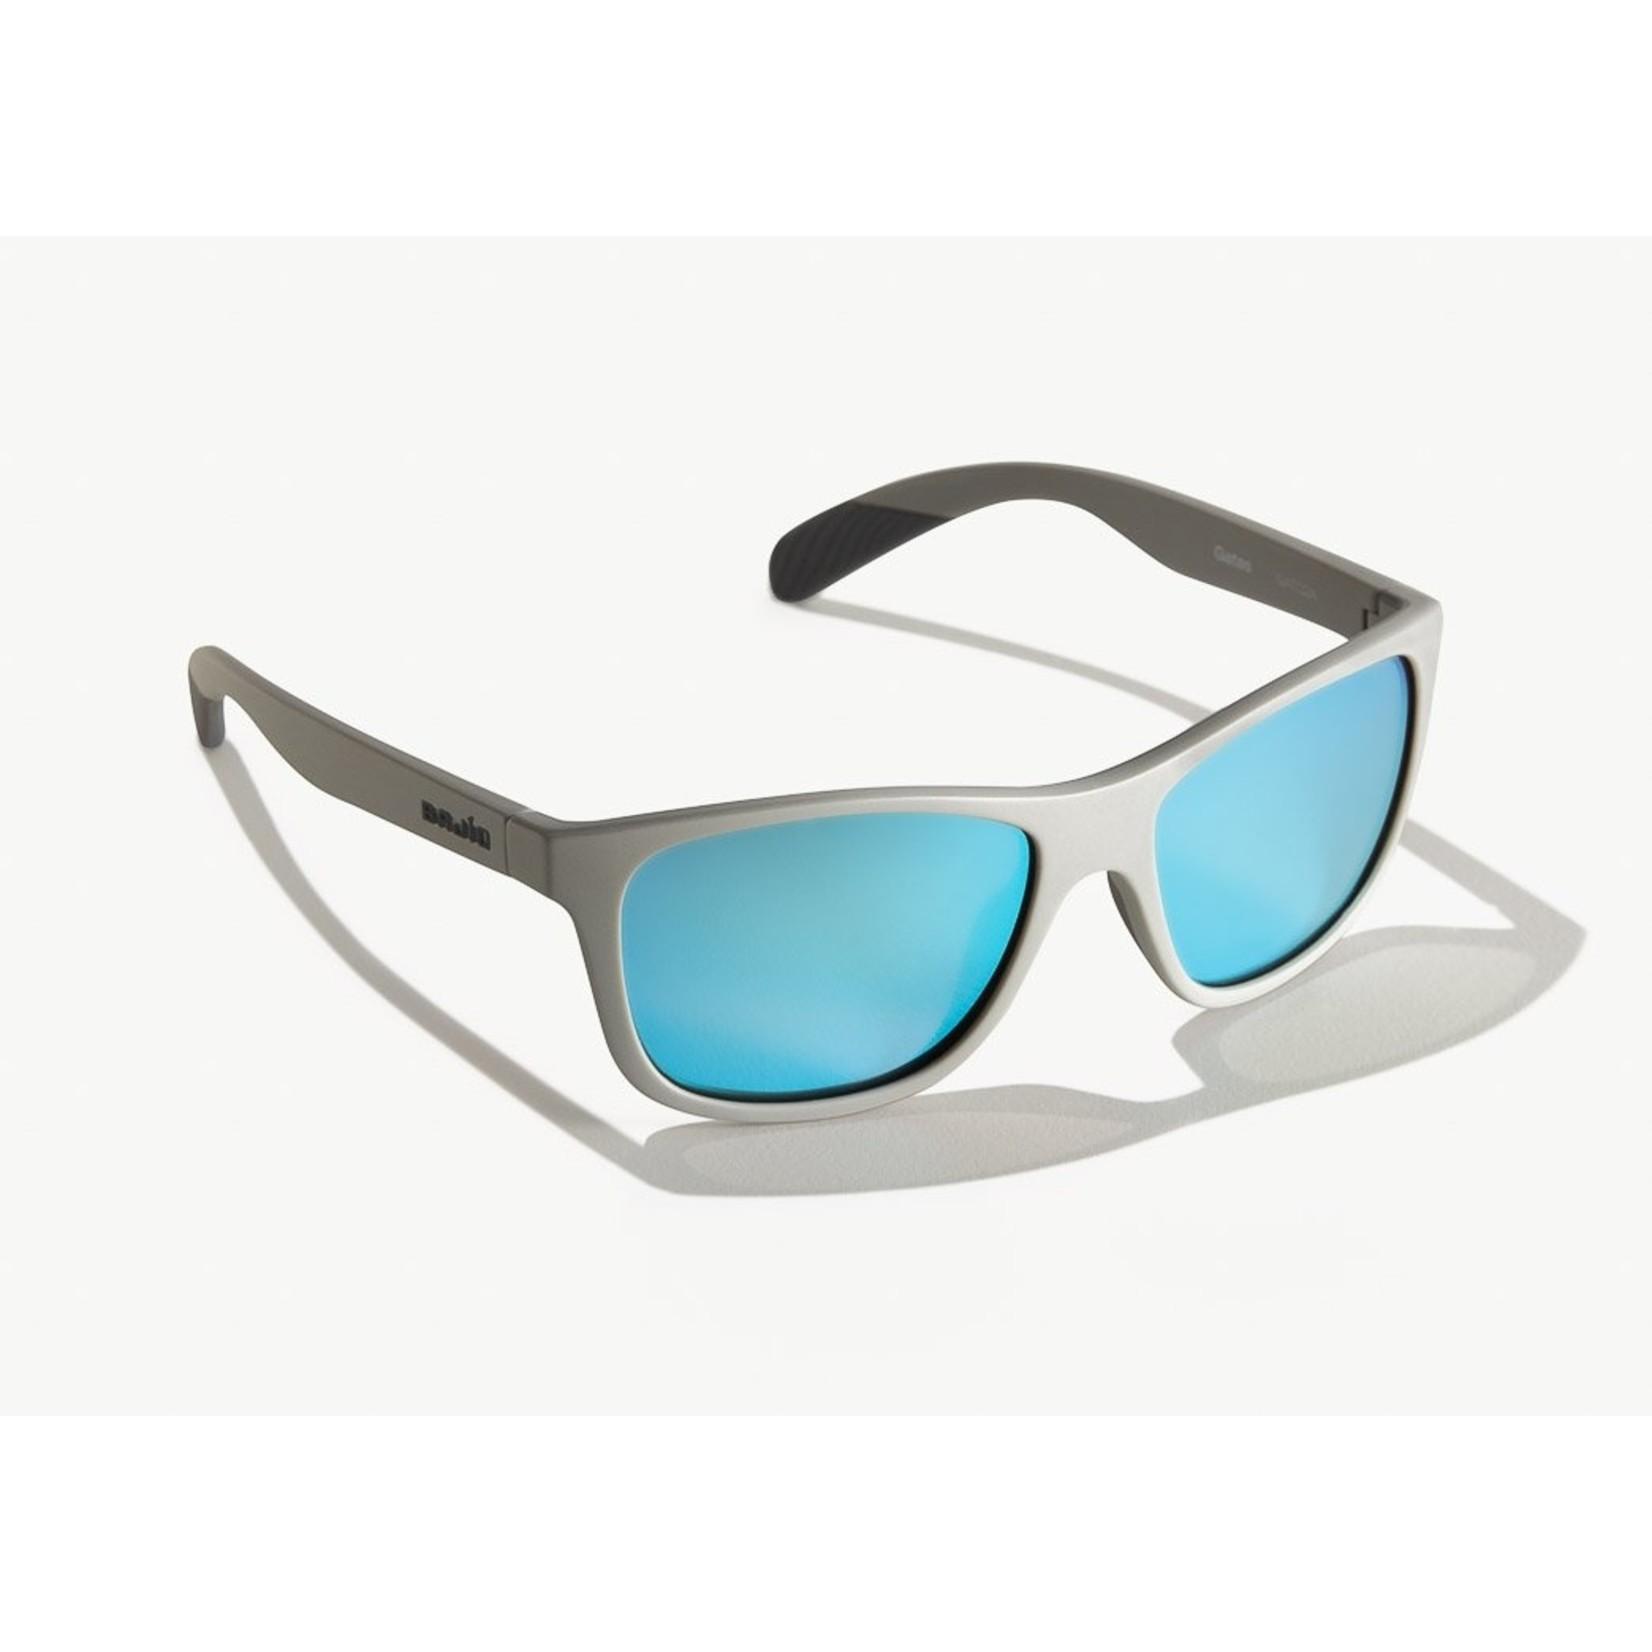 Bajio Bajio Gates Polarized Sunglasses